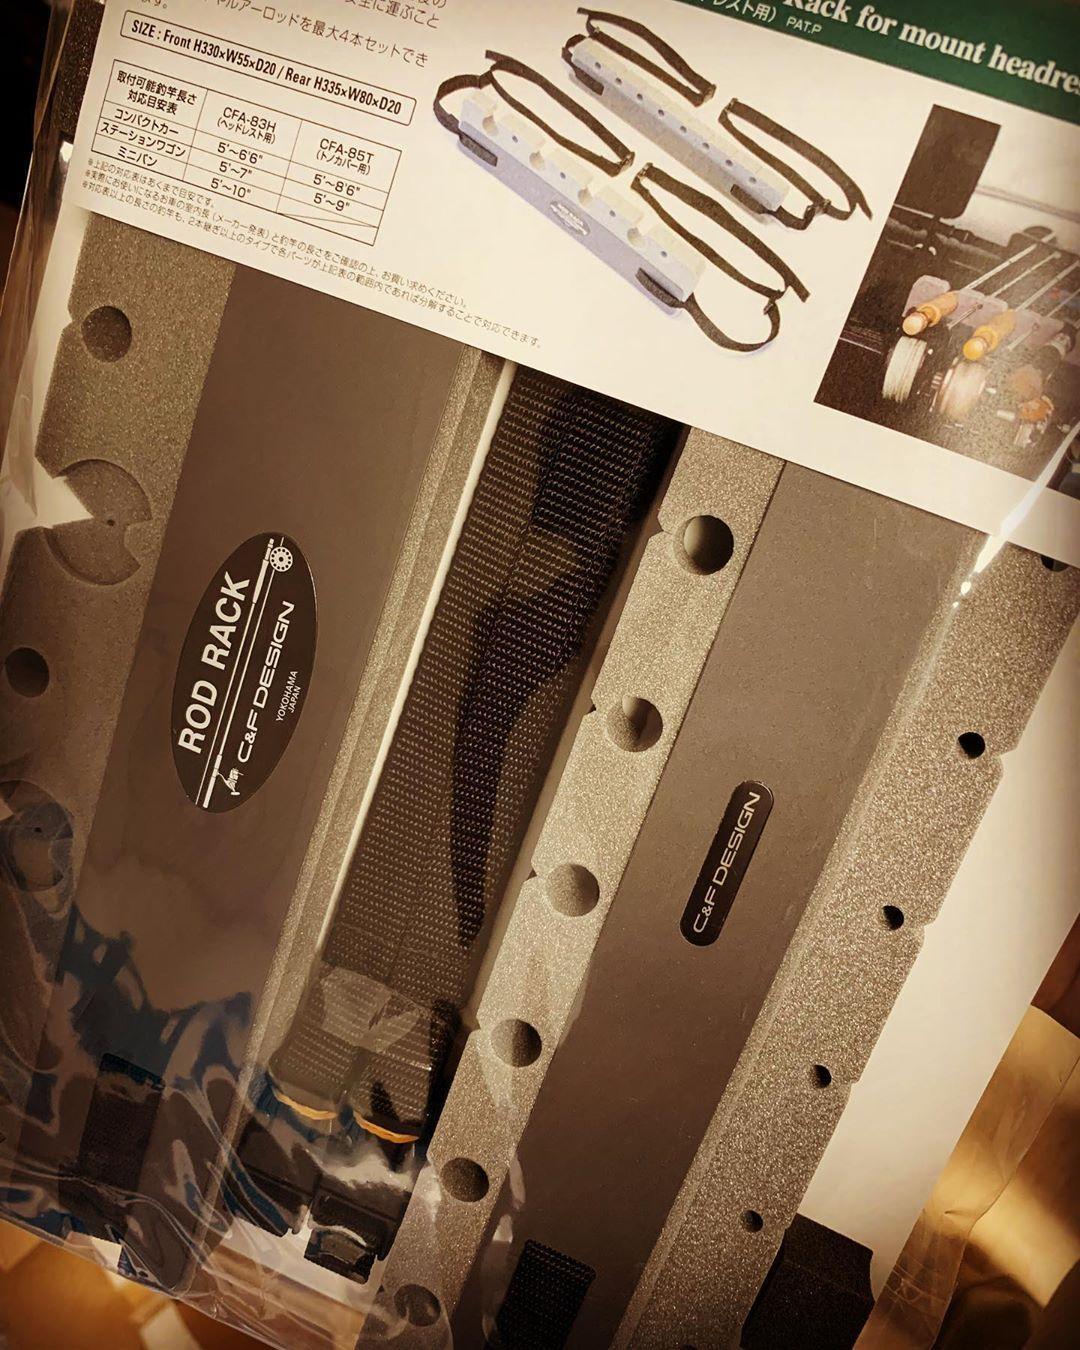 C F Design Rod Rack Headrest Mounting Rod Rack Rod Headrest